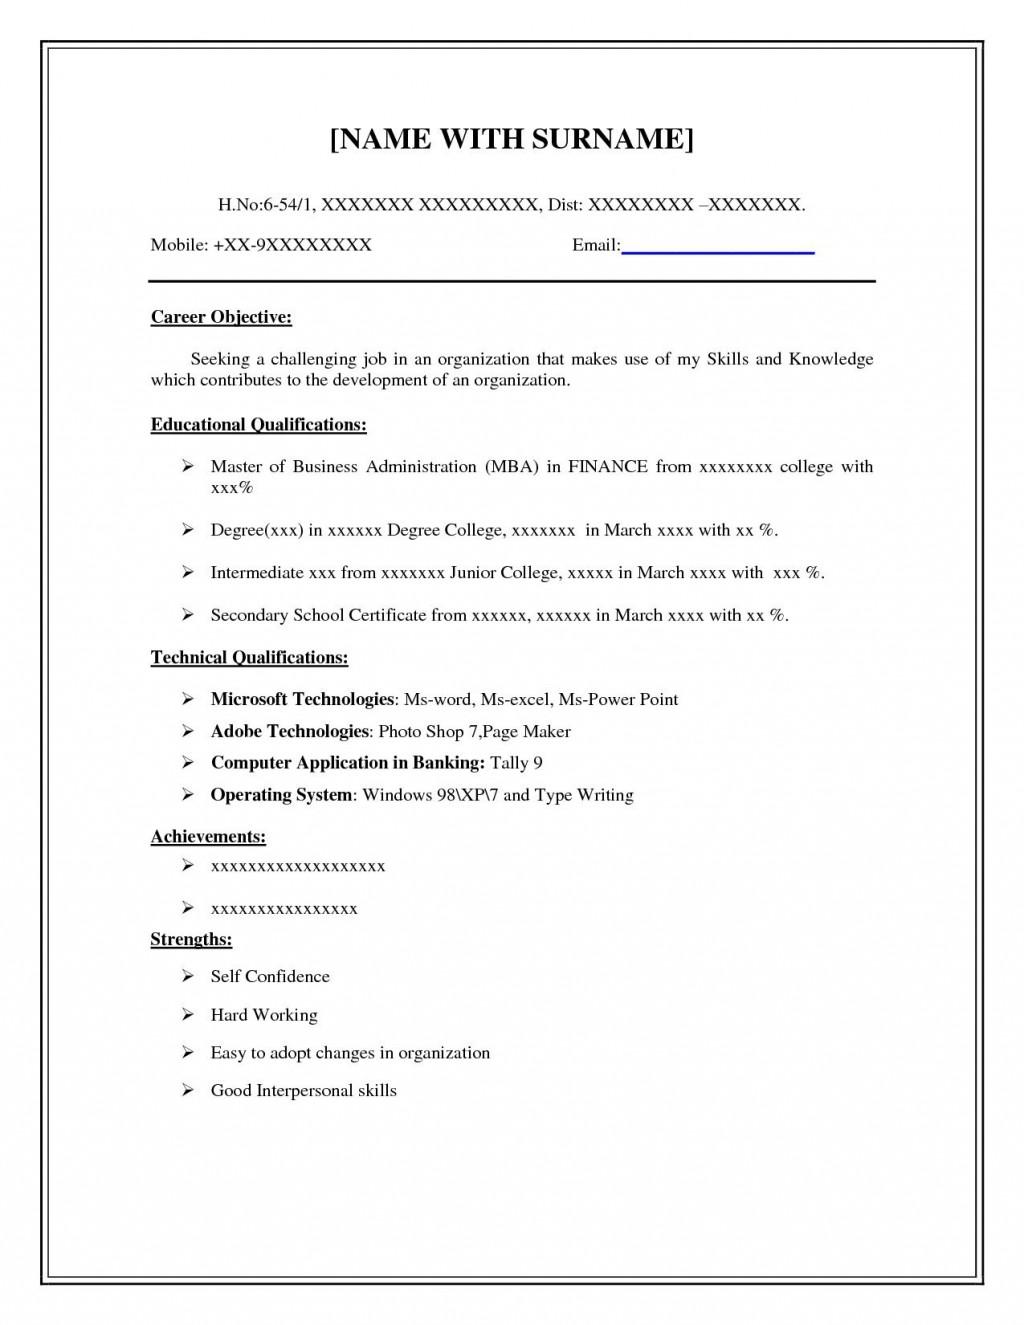 001 Wonderful Basic Resume Template Free High Def  Easy Download Word Australia DocLarge